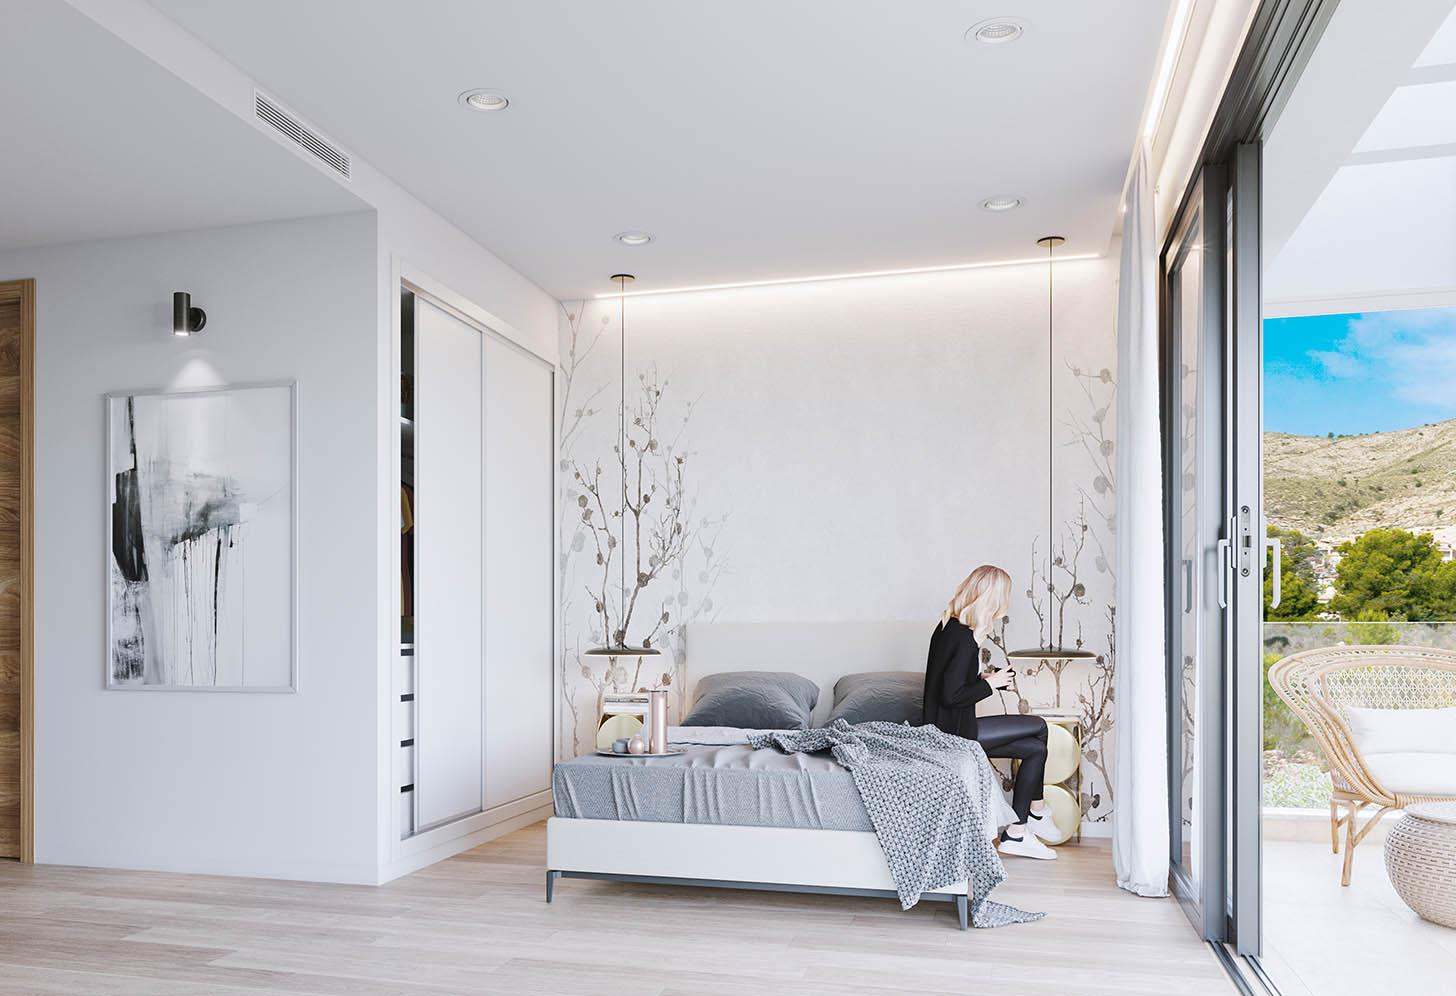 immobilier neuf espagne costa blanca nord finestrat chambre principal